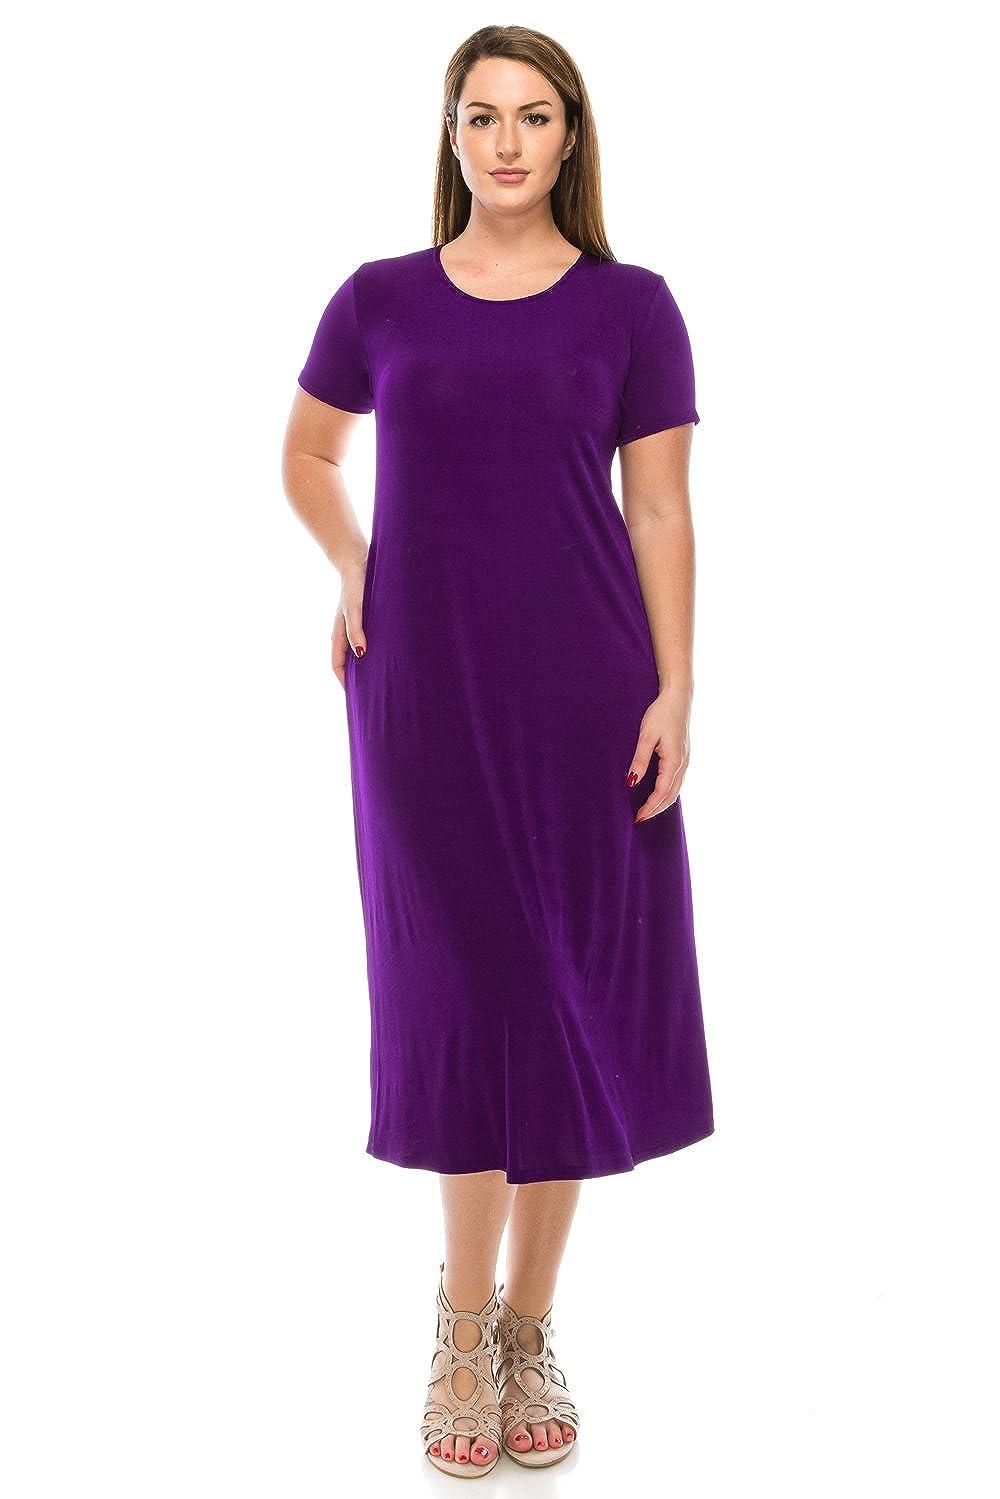 Jostar Womens Stretchy Long Dress Short Sleeve